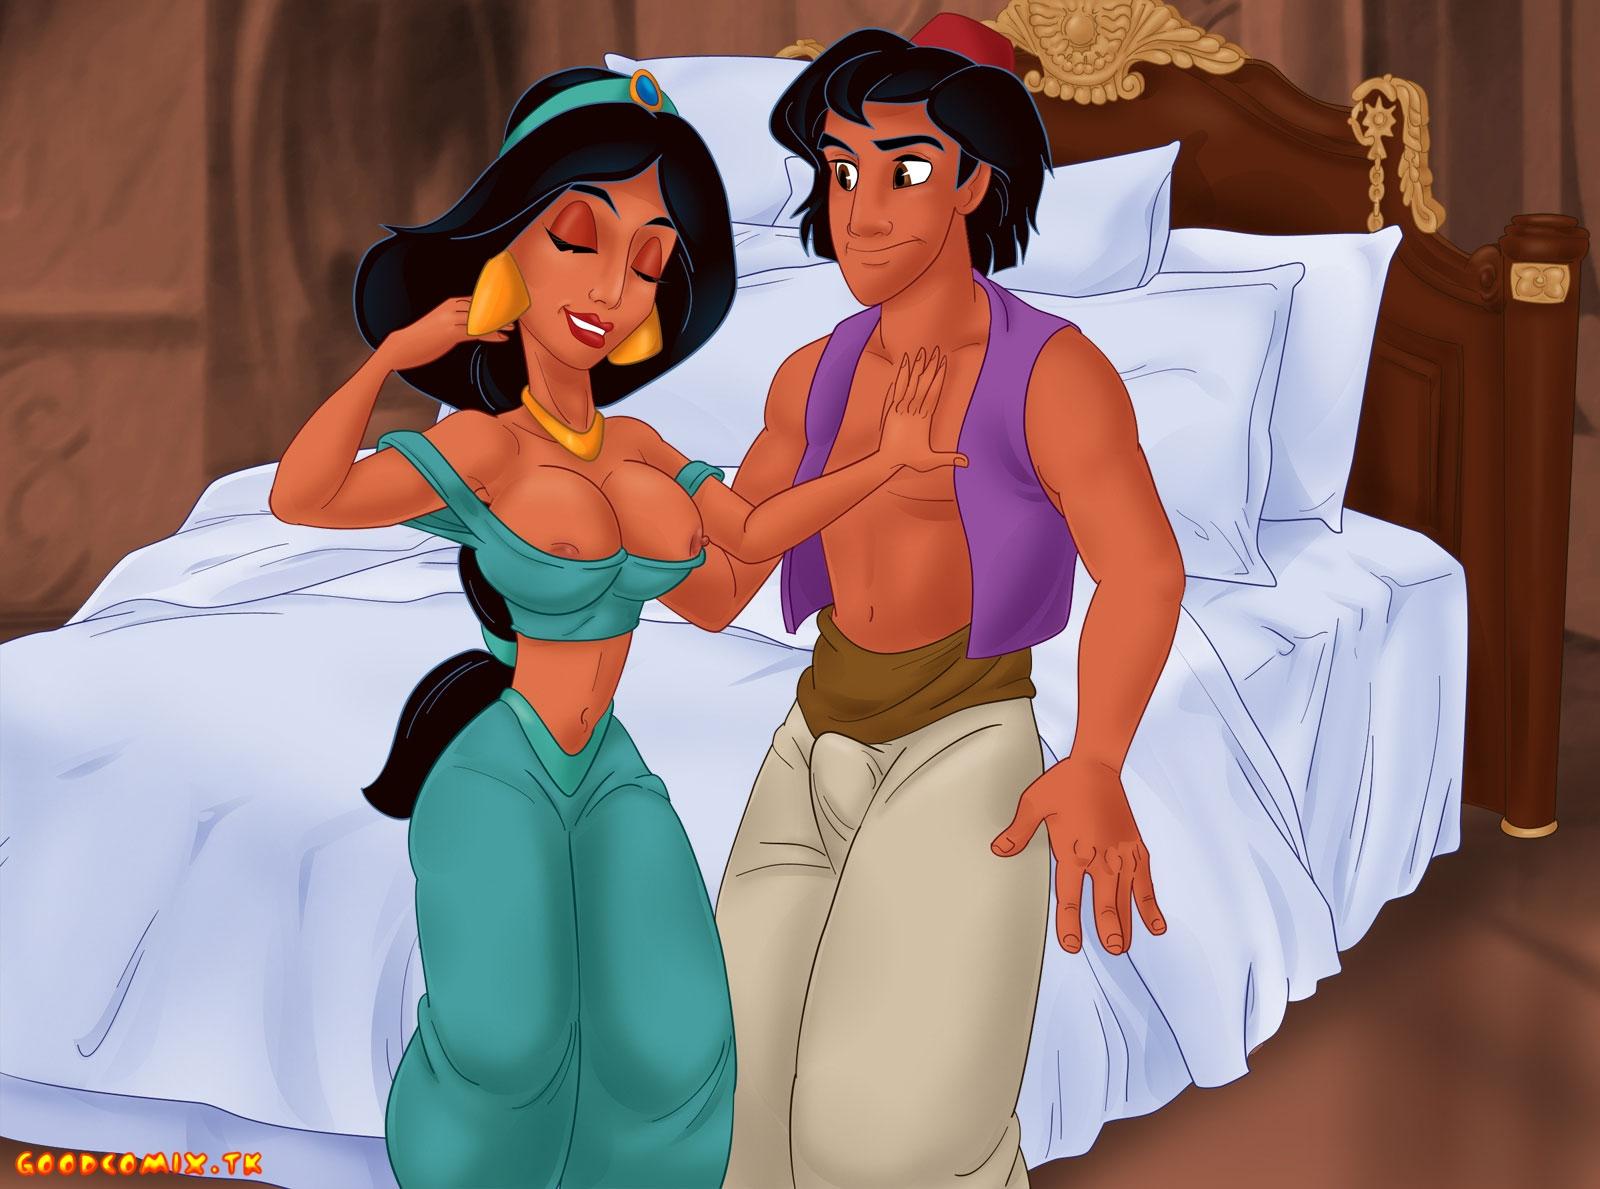 Goodcomix Aladdin - [TitFlaviy] - Family Eastern Sex